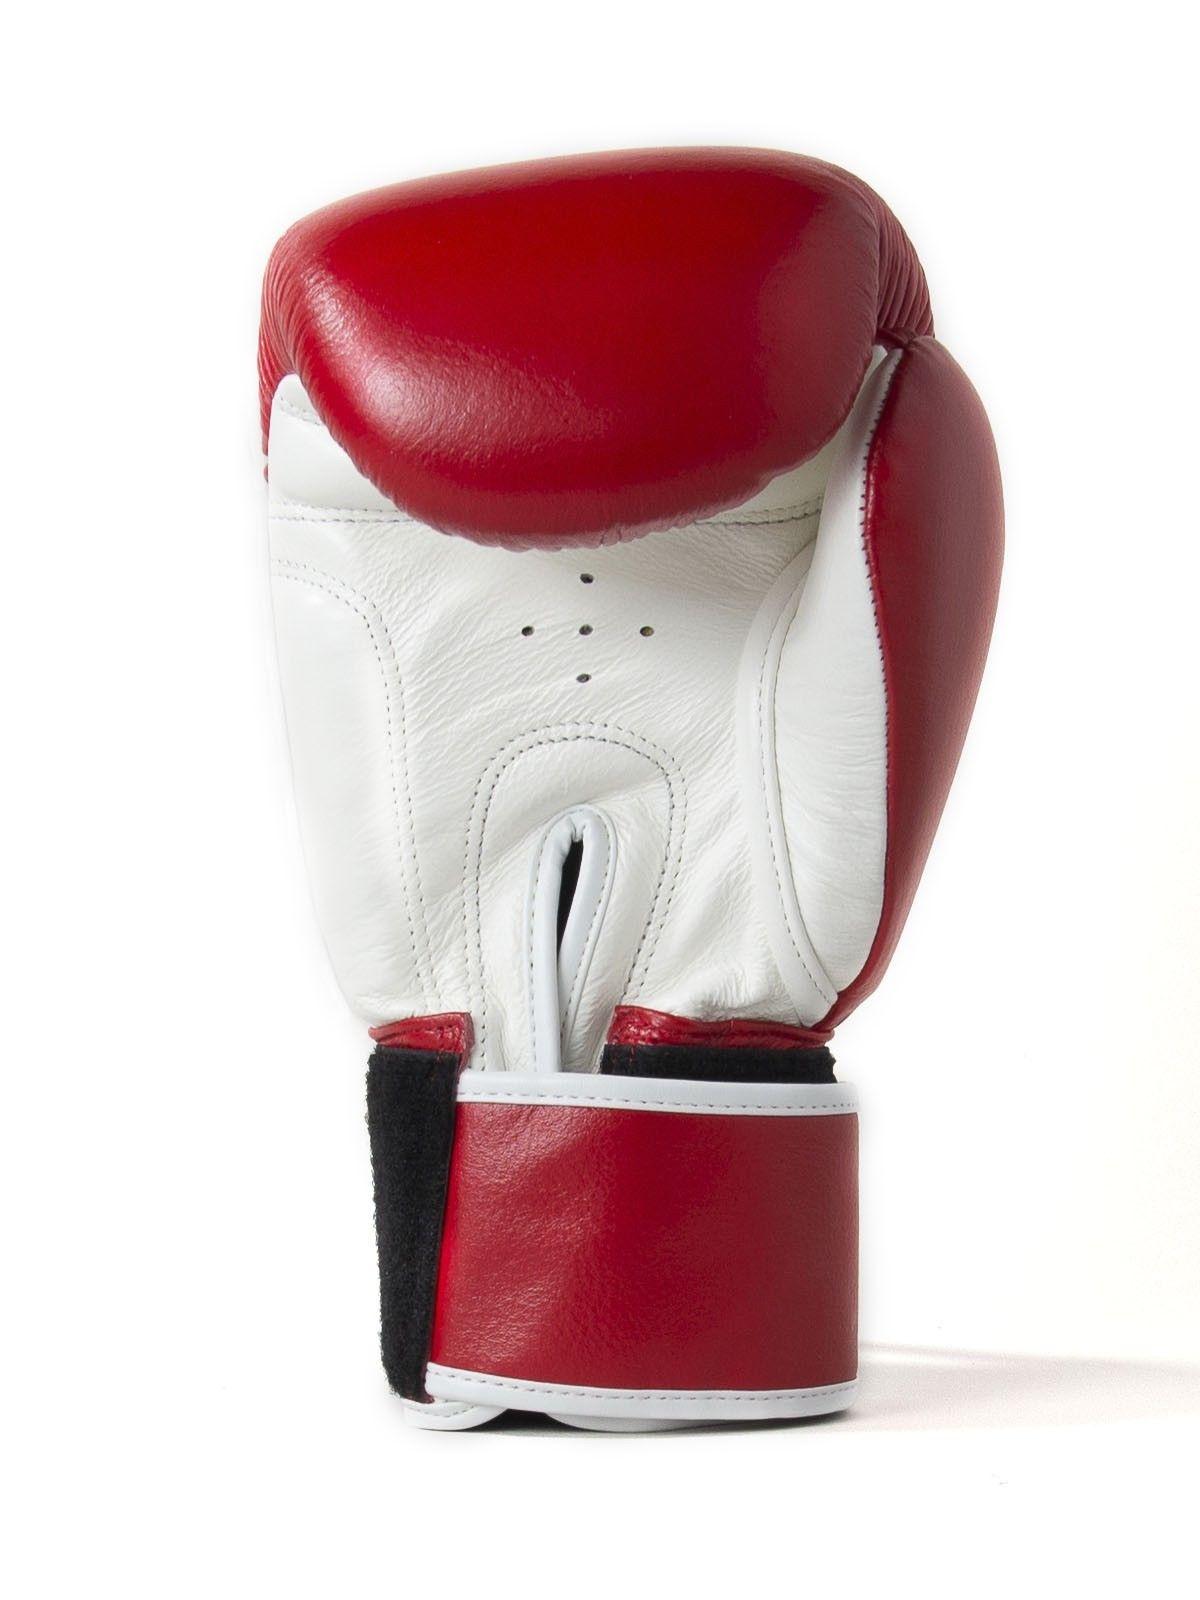 Sandee Red-White Boxing Gloves 16oz